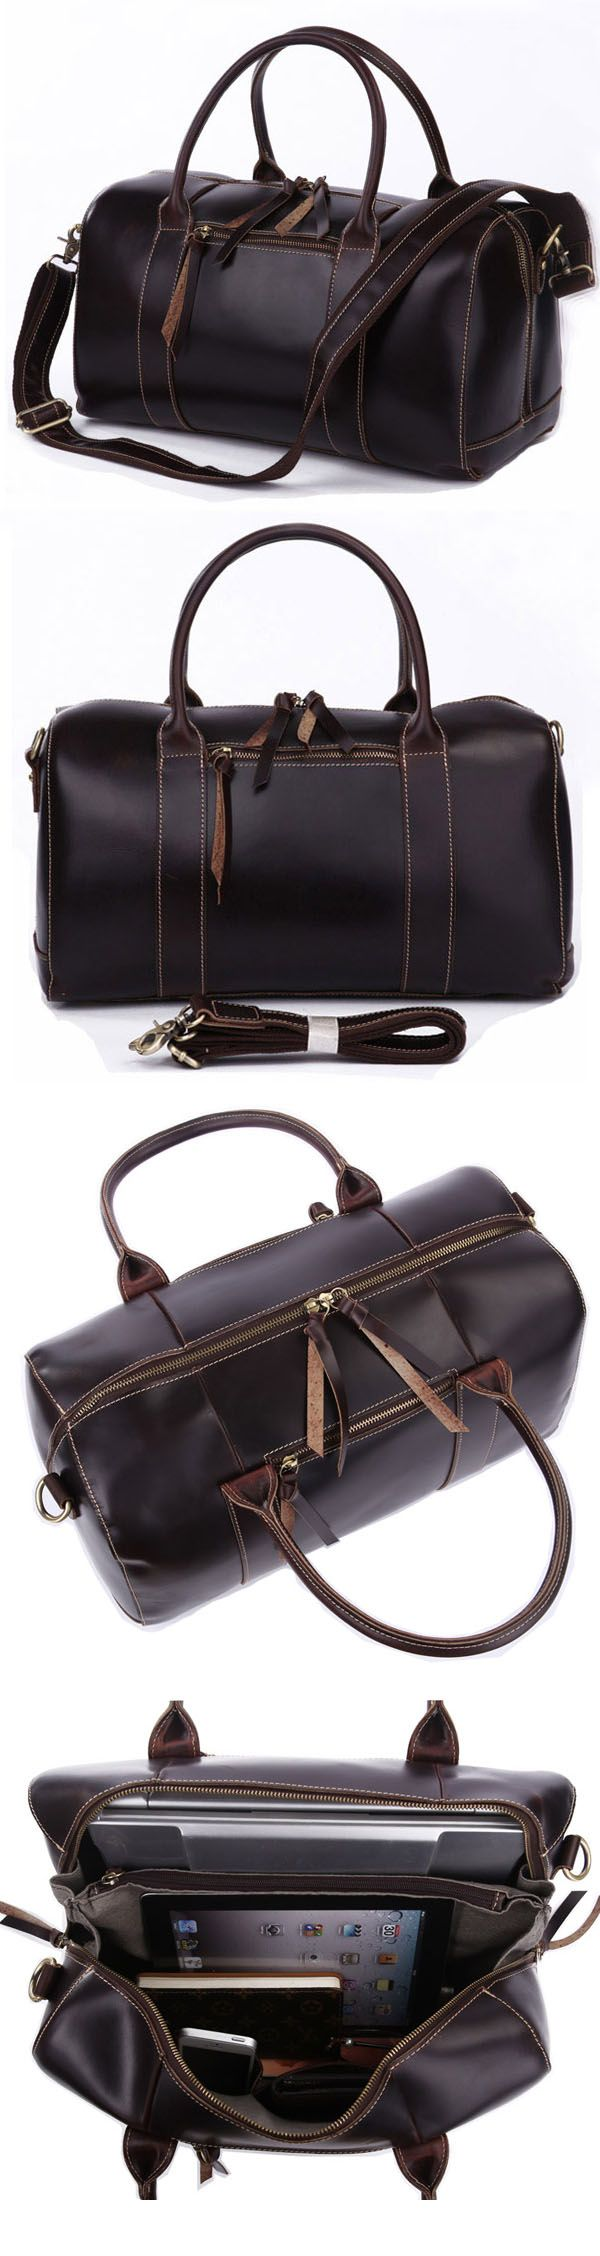 Handmade Antique Genuine Crazy Horse Leather Travel Bag Tote Messenger Bag Duffle Luggage Baggage